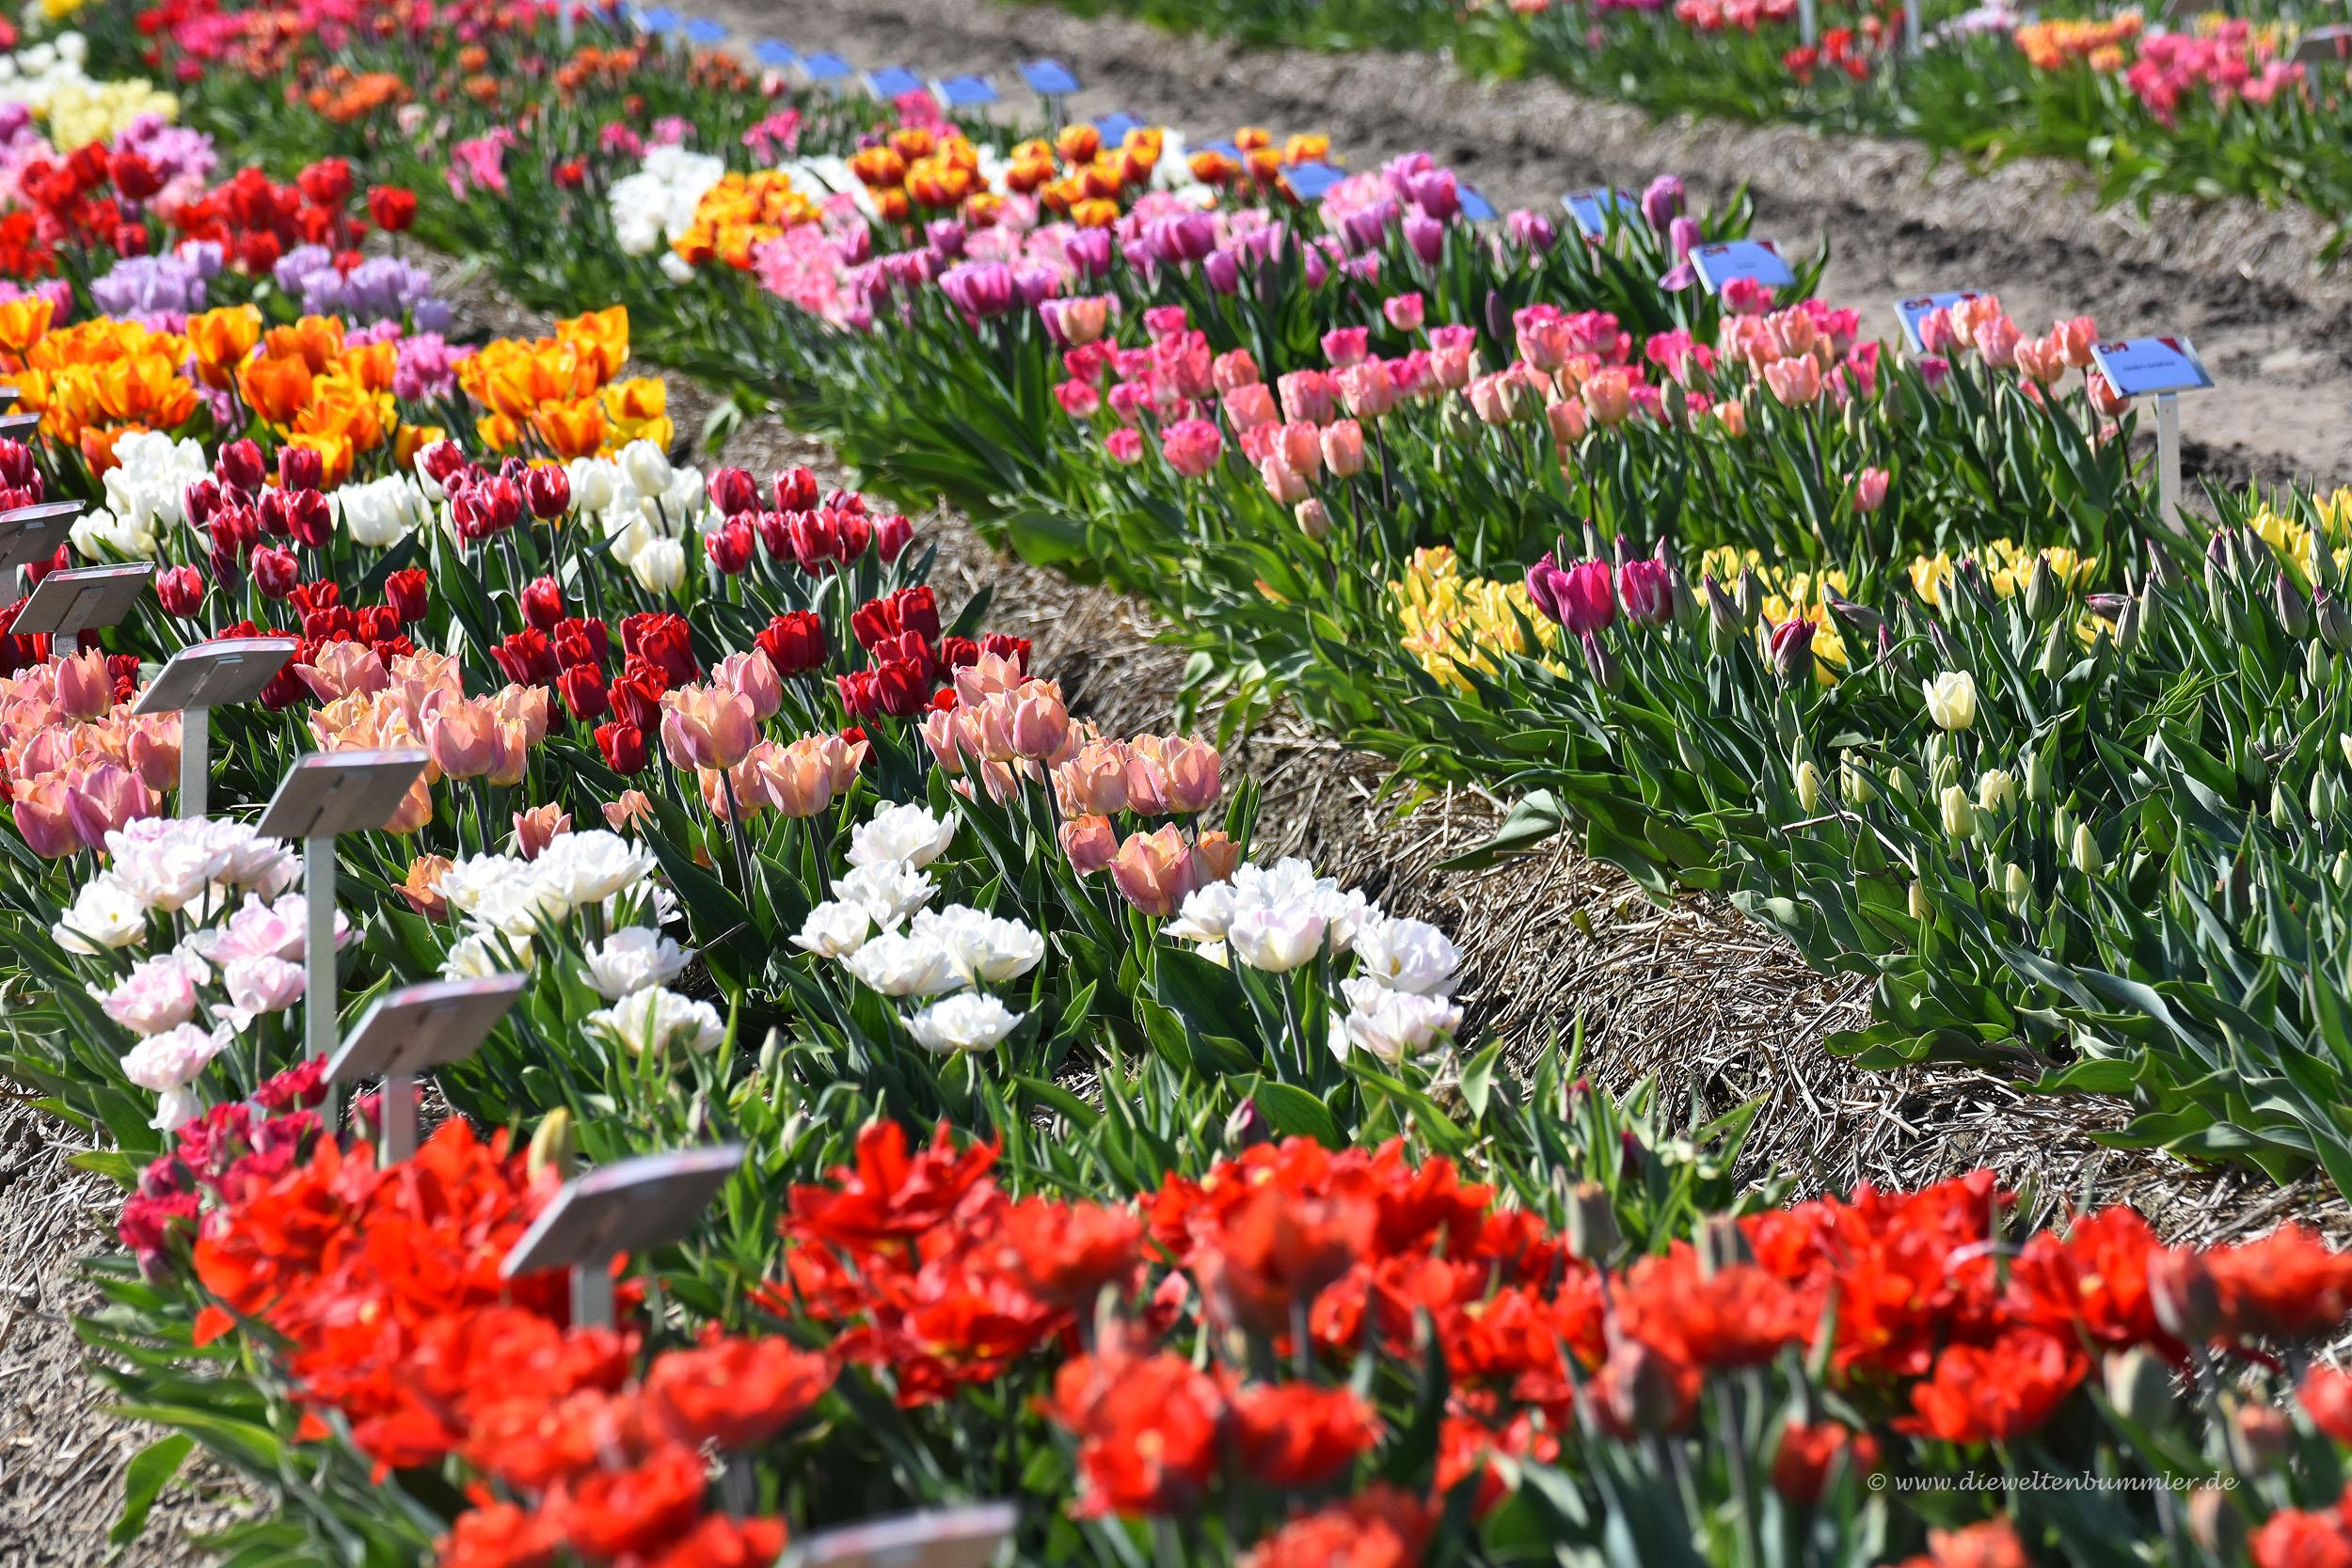 Viele verschiedene Tulpenarten